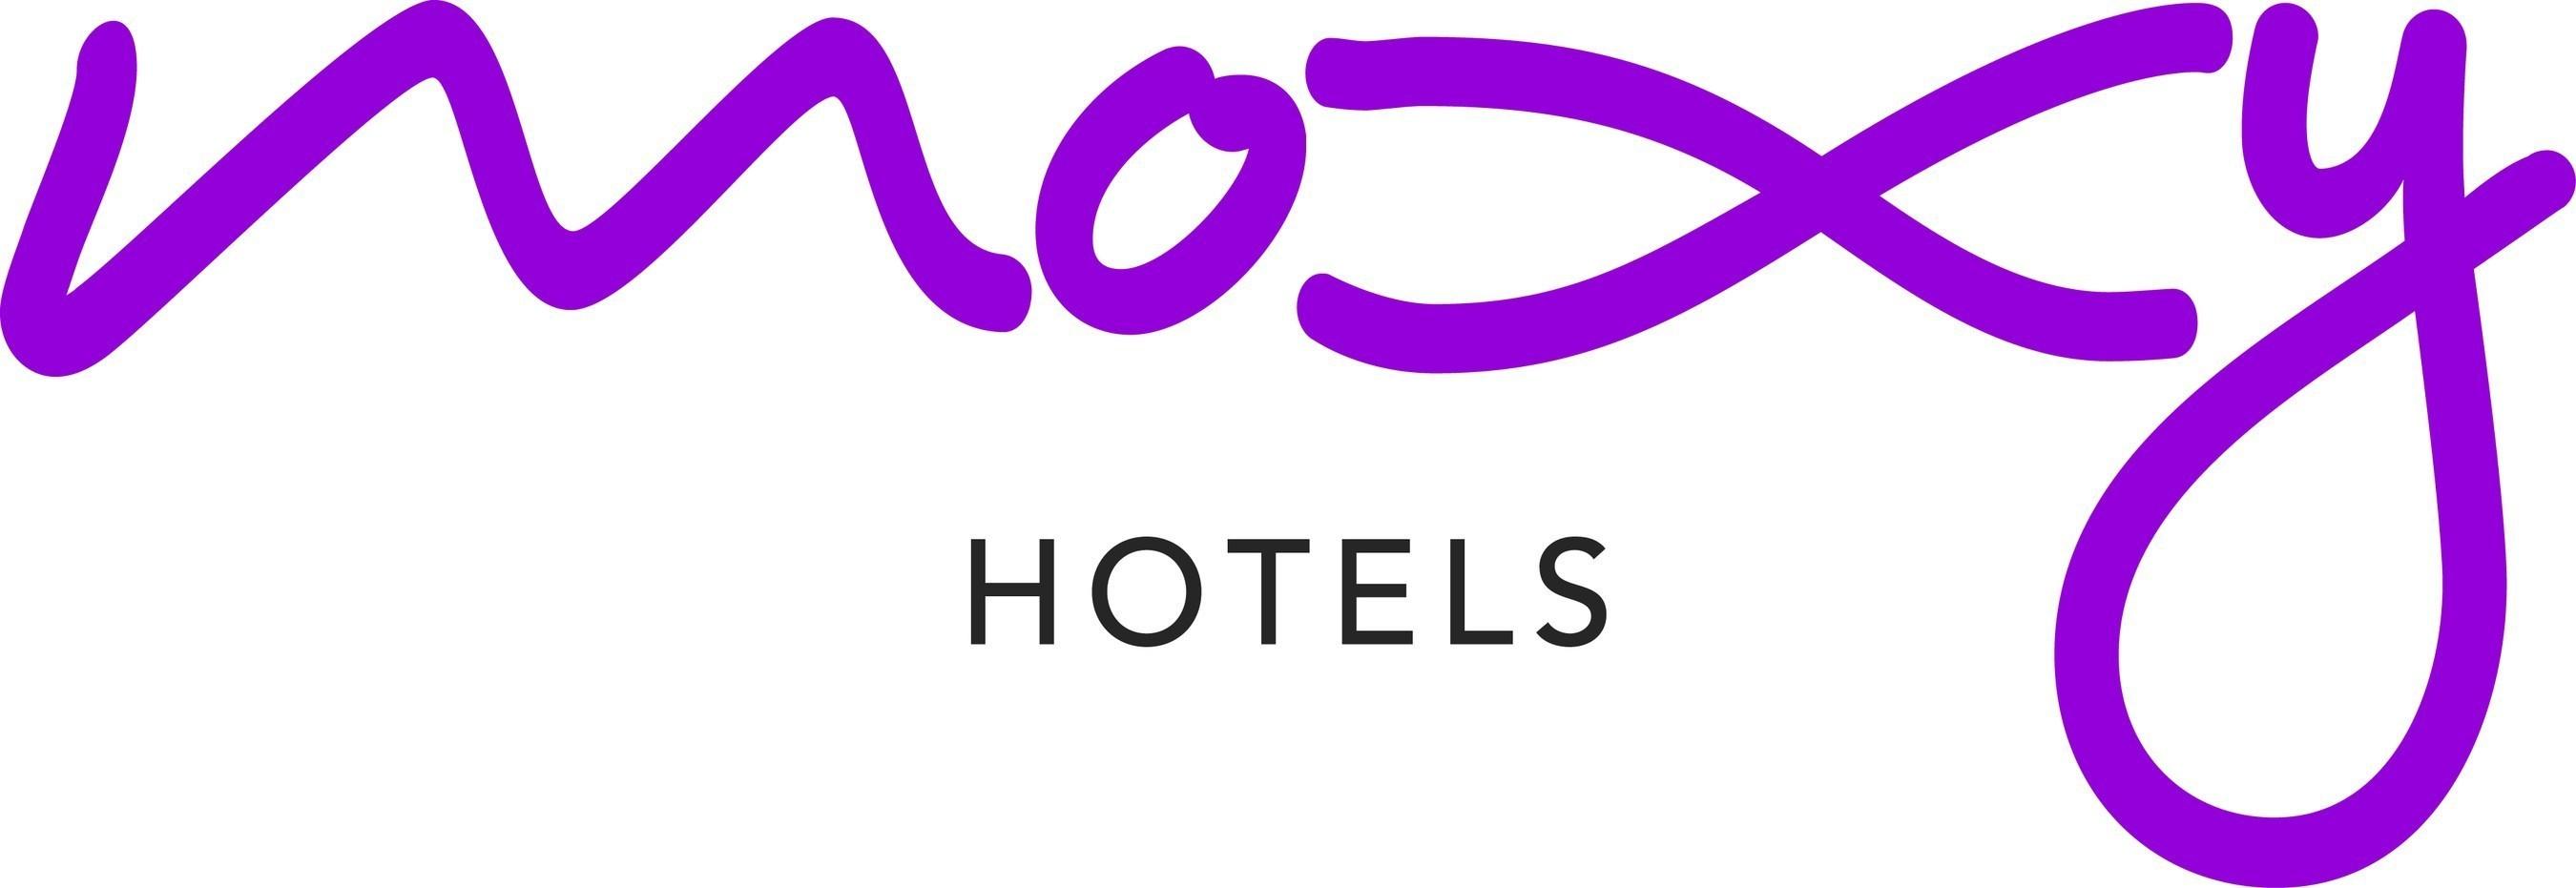 Moxy Hotels logo (PRNewsFoto/Marriott International, Inc.)